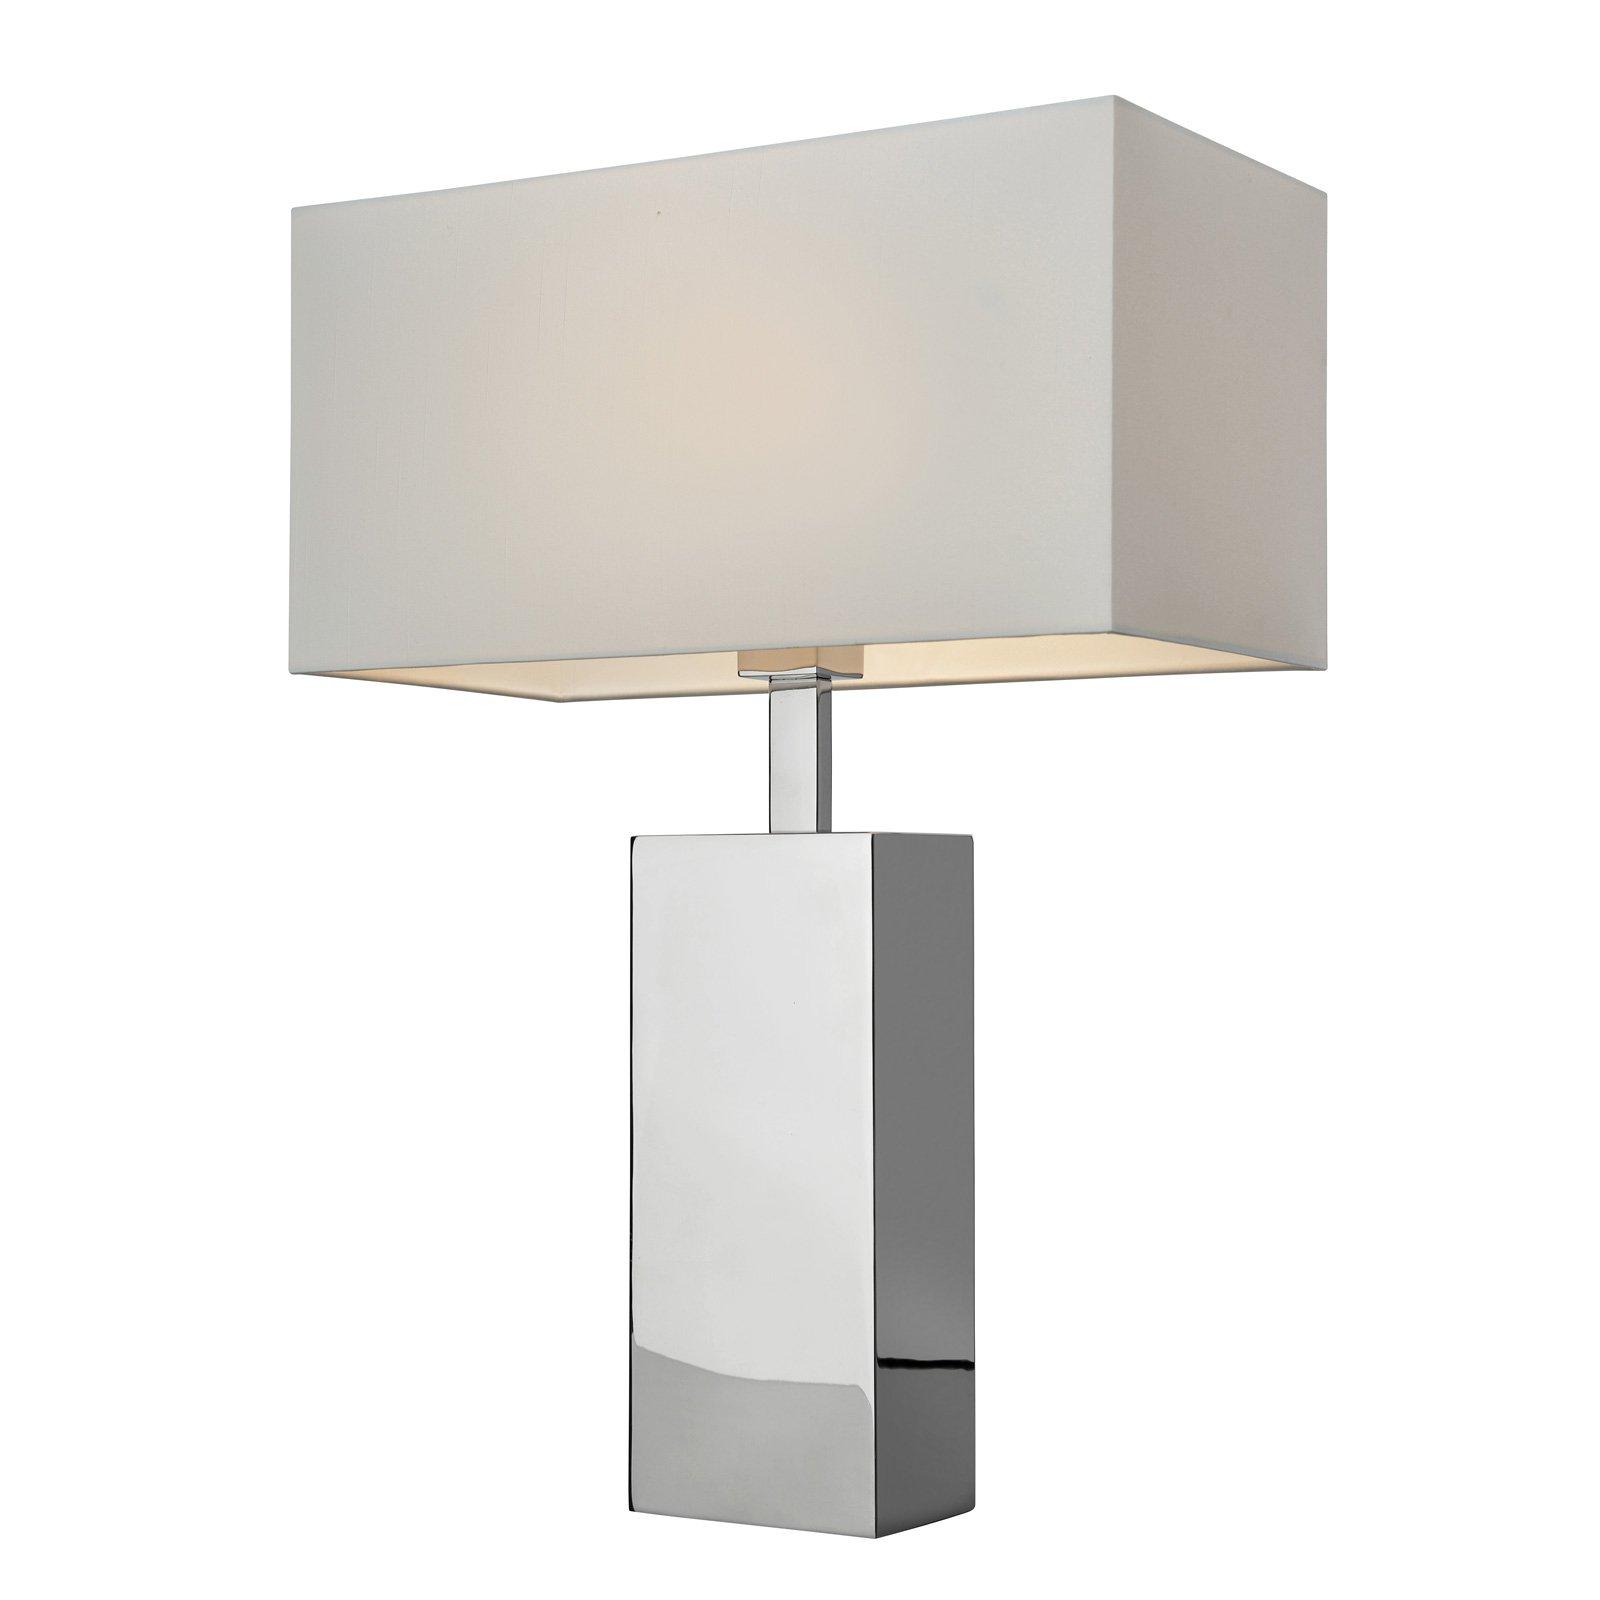 Bordlampe Block, høyde 56 cm